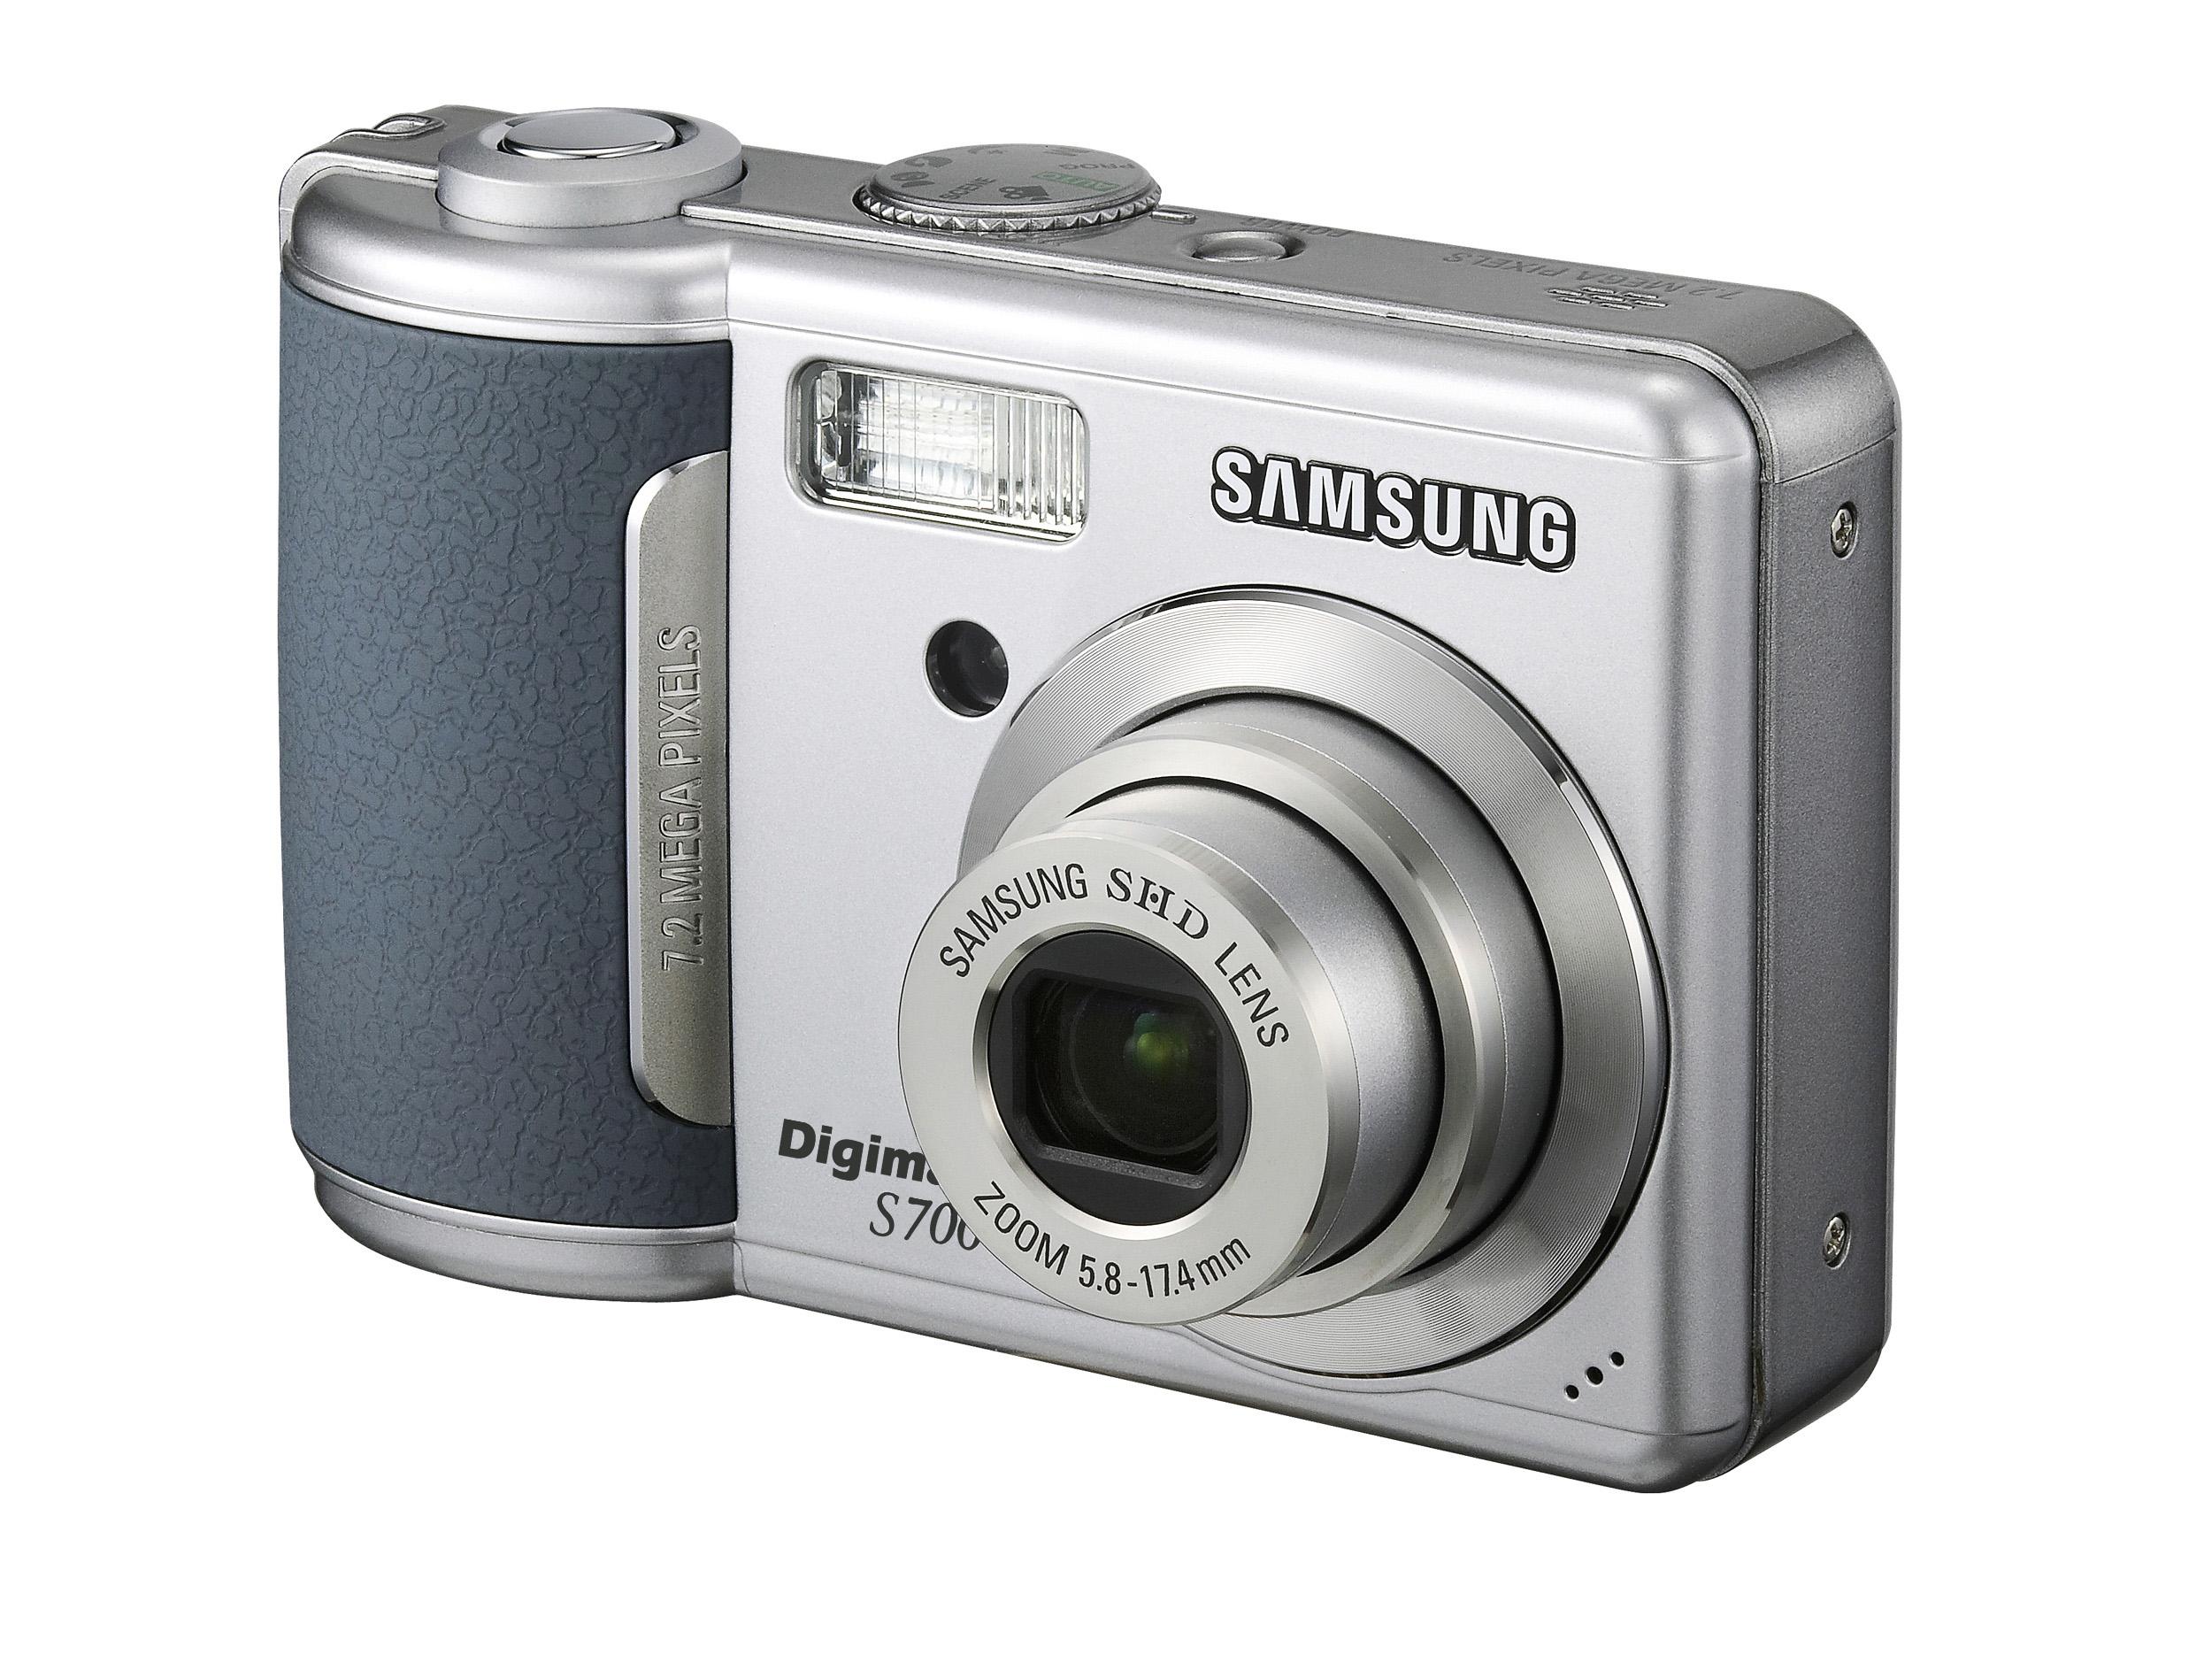 Samsung techwin <Digimax S700 / Kenox S700 / Digimax Cyber 730>